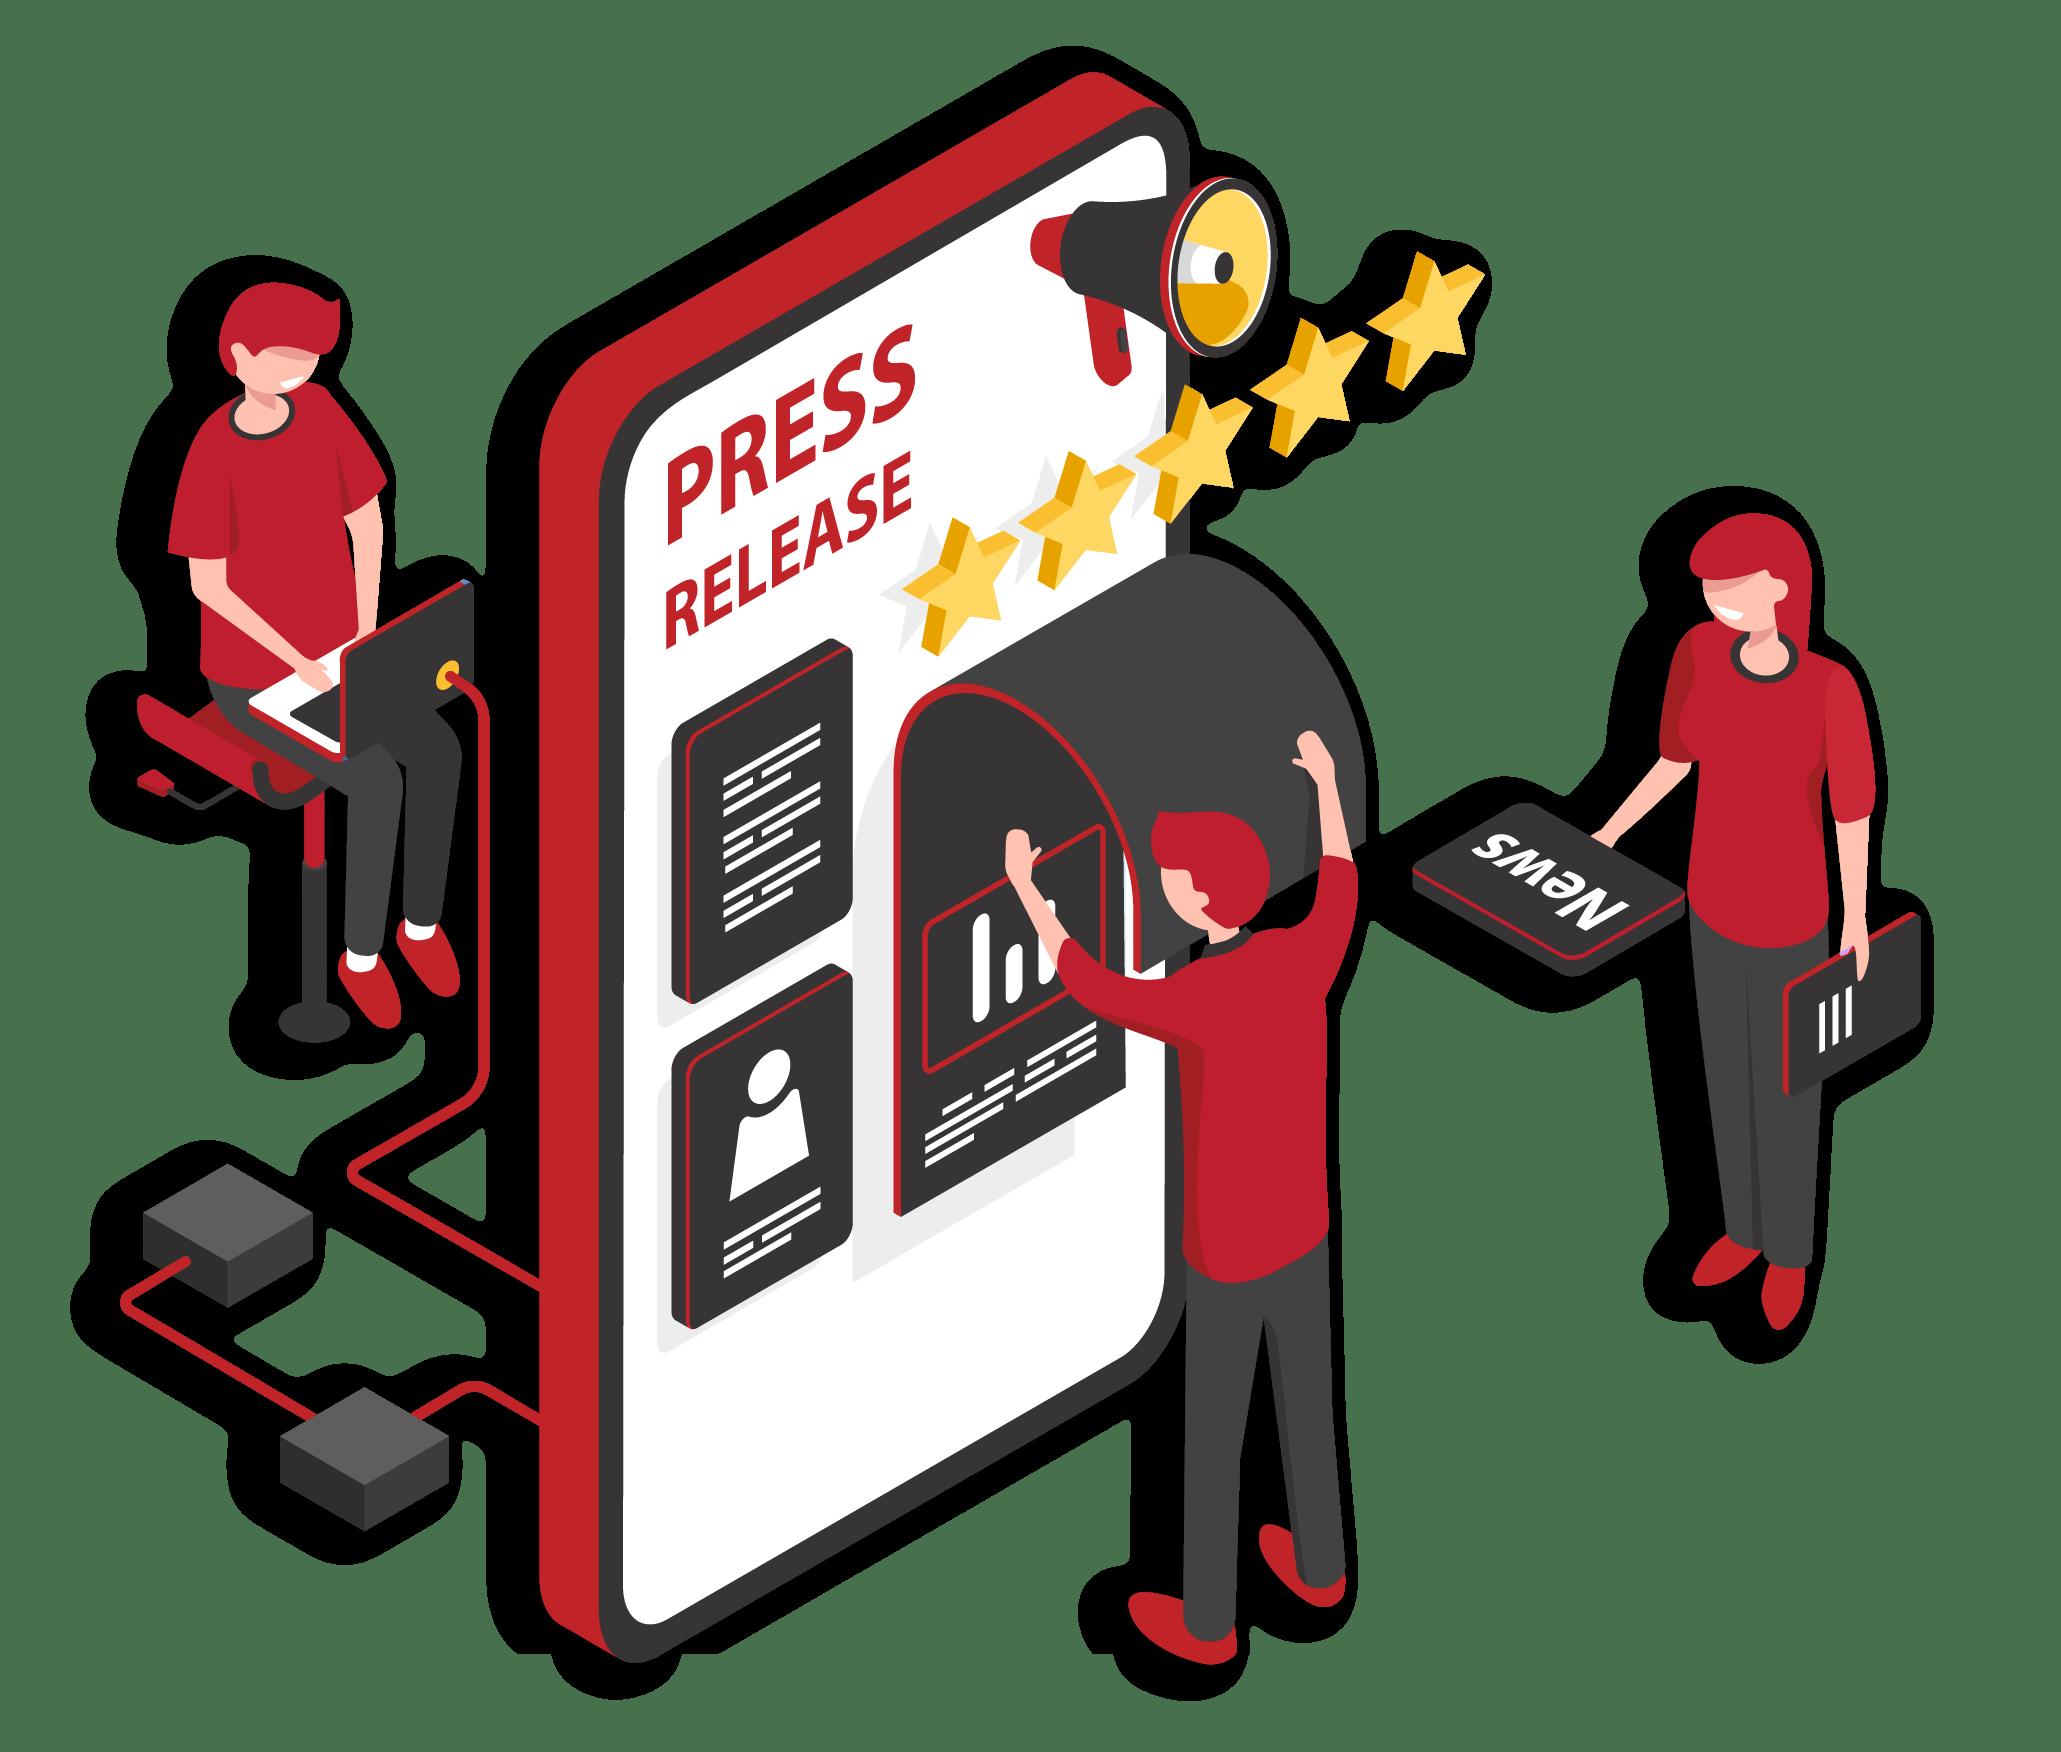 Press Release Service Reinforce Lab